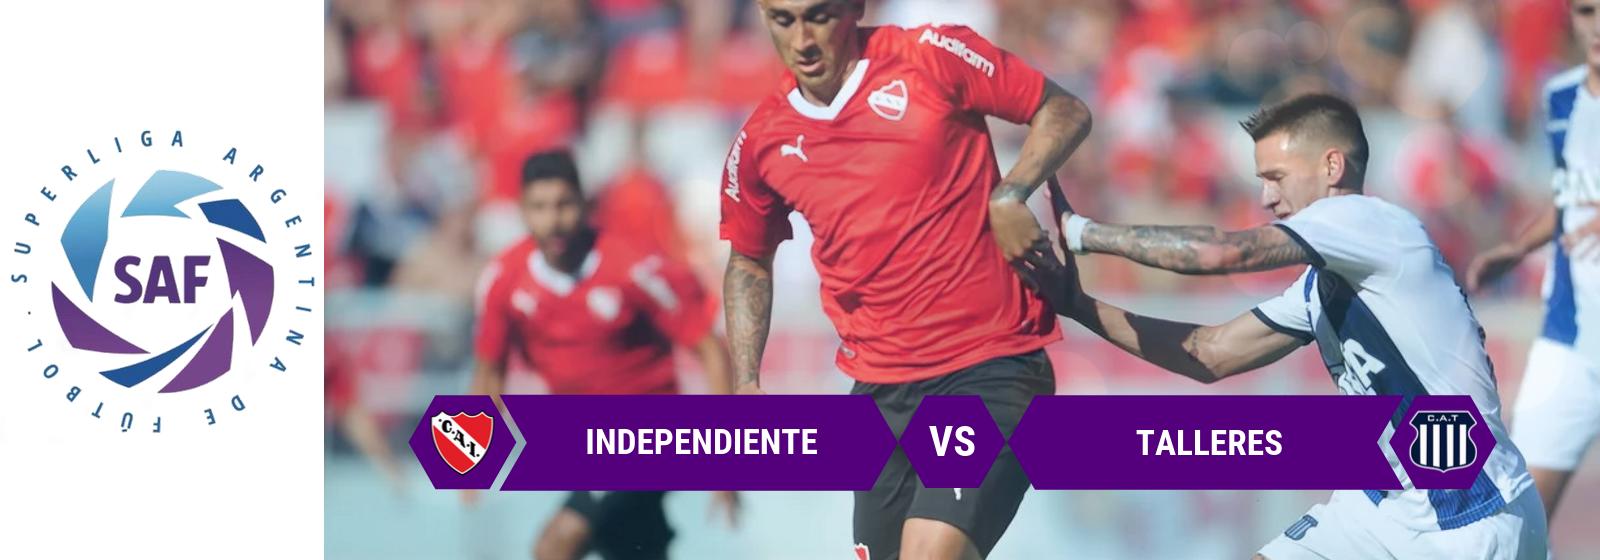 SAF Independiente Vs. Talleres Asian Connect